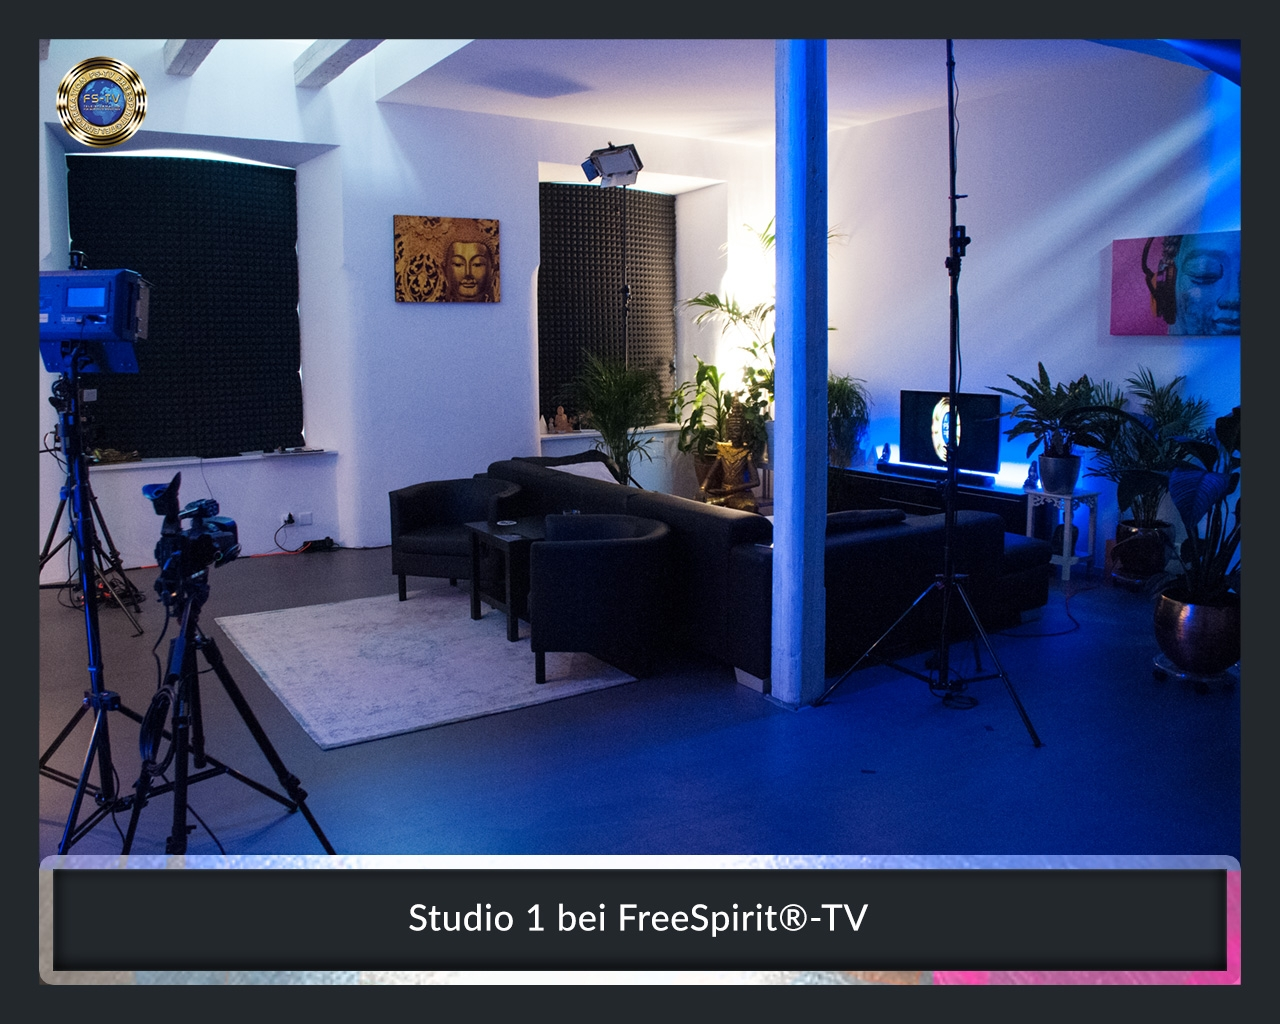 FS-TV-Bildergallerie-Studio1.1